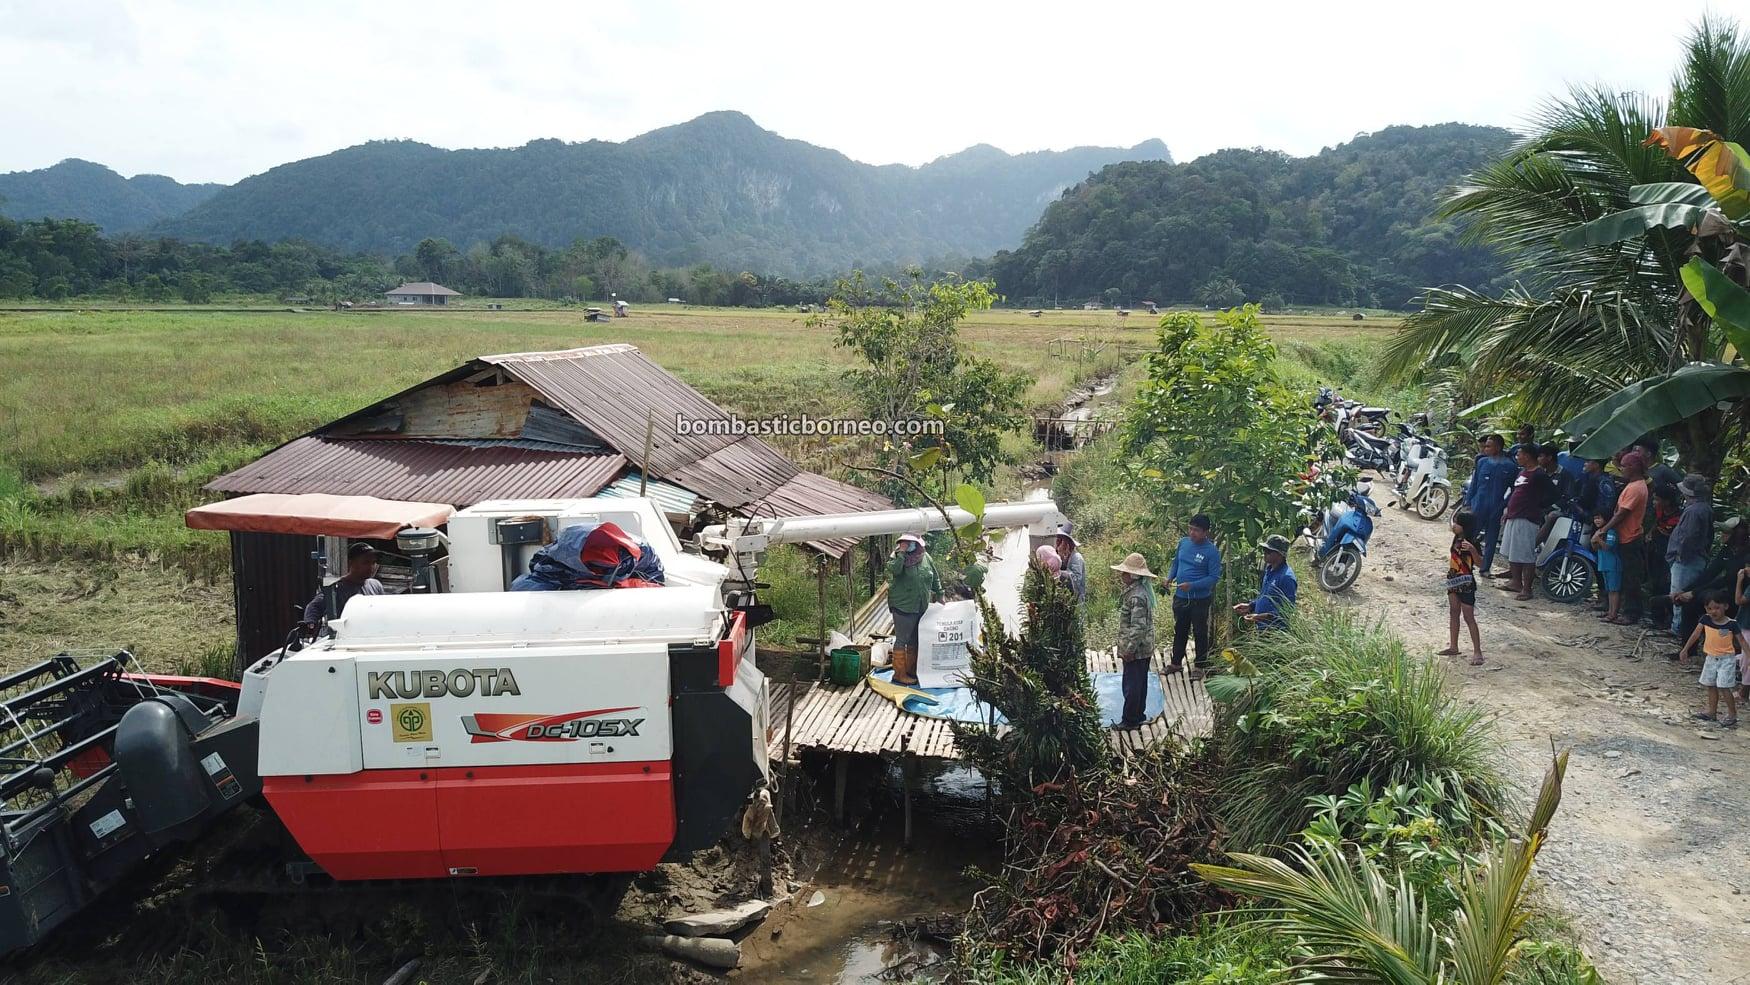 Kampung Chupak, Paddy Fields, Paddy Farming, Paddy Harvesting, Sawah Padi, Penuaian Padi, Tourism, tourist attraction, travel guide, travel local, Borneo, 马来西亚砂拉越, 西连稻米之乡, 比达友稻谷收割,